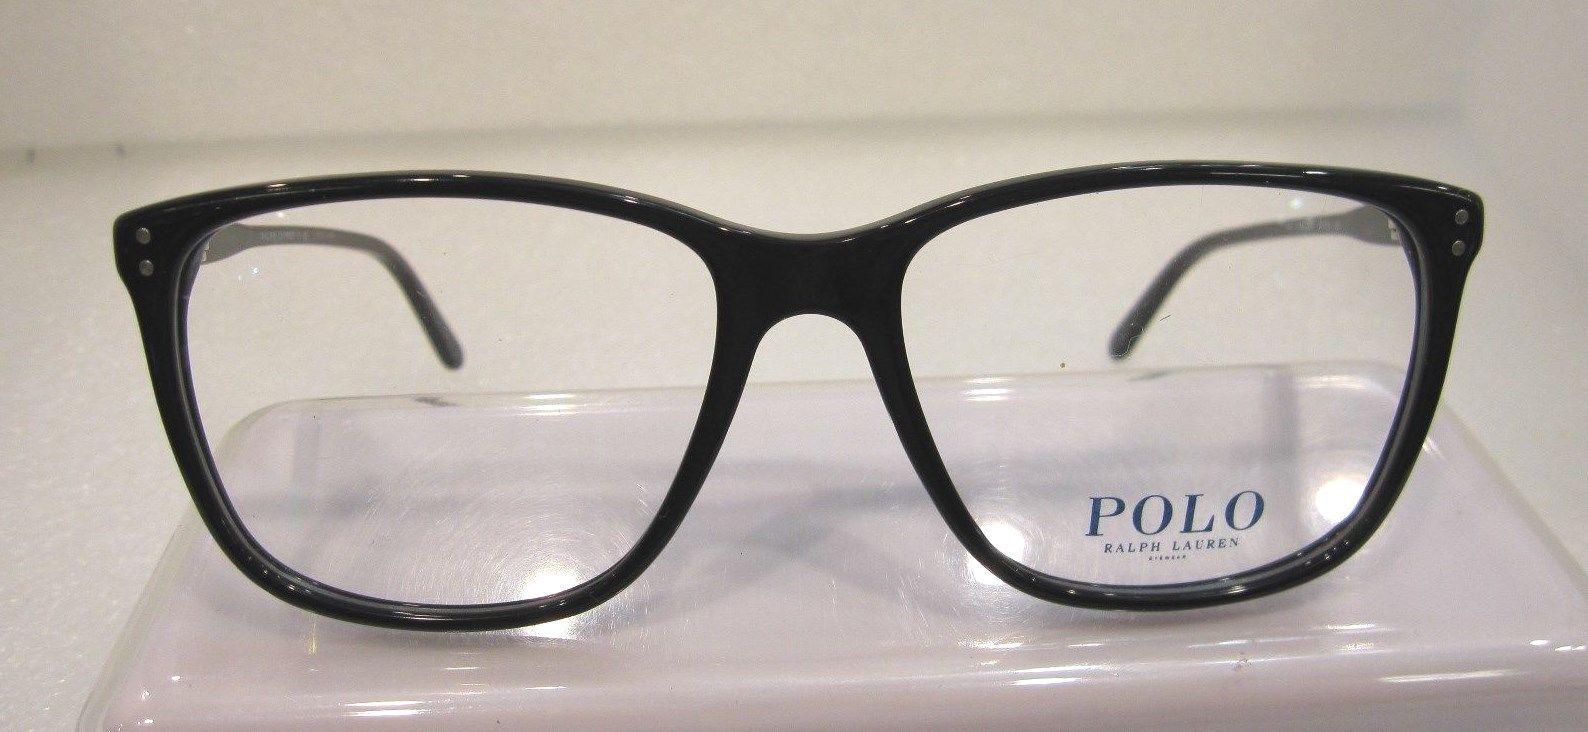 ralph lauren eyeglasses online store - Eyeglasses Online Store